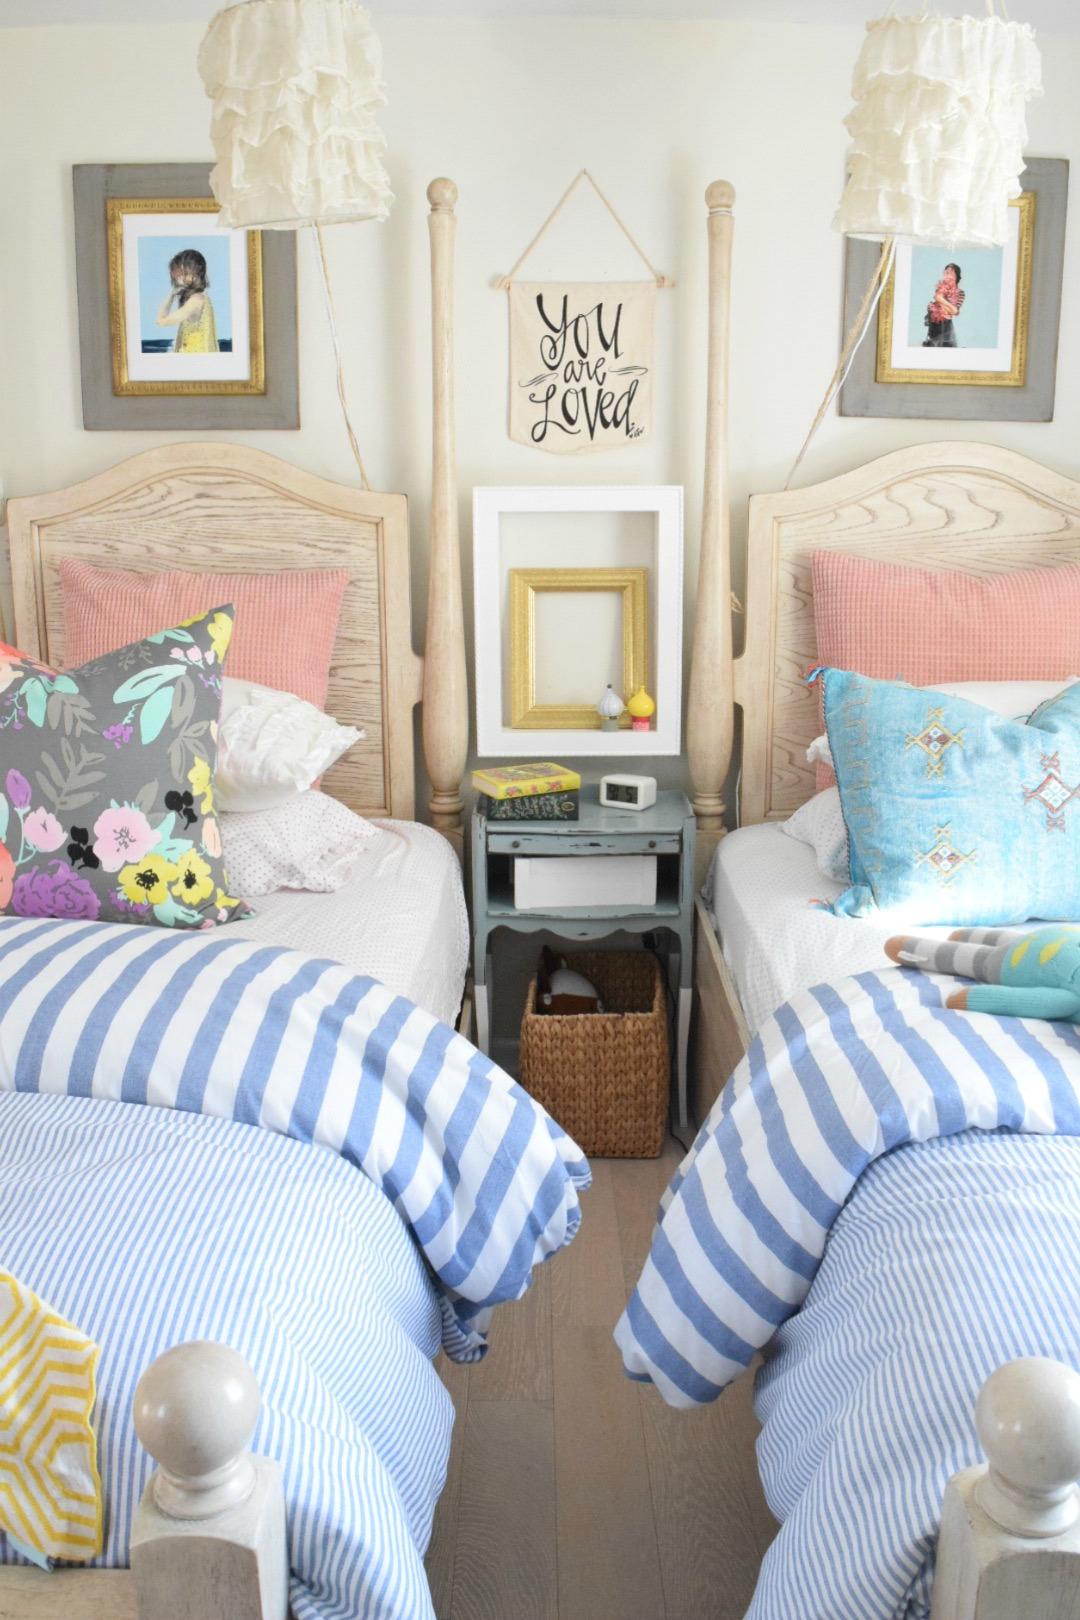 Summer Home Decor Ideas- Our Summer Tour 2017 - Nesting ...